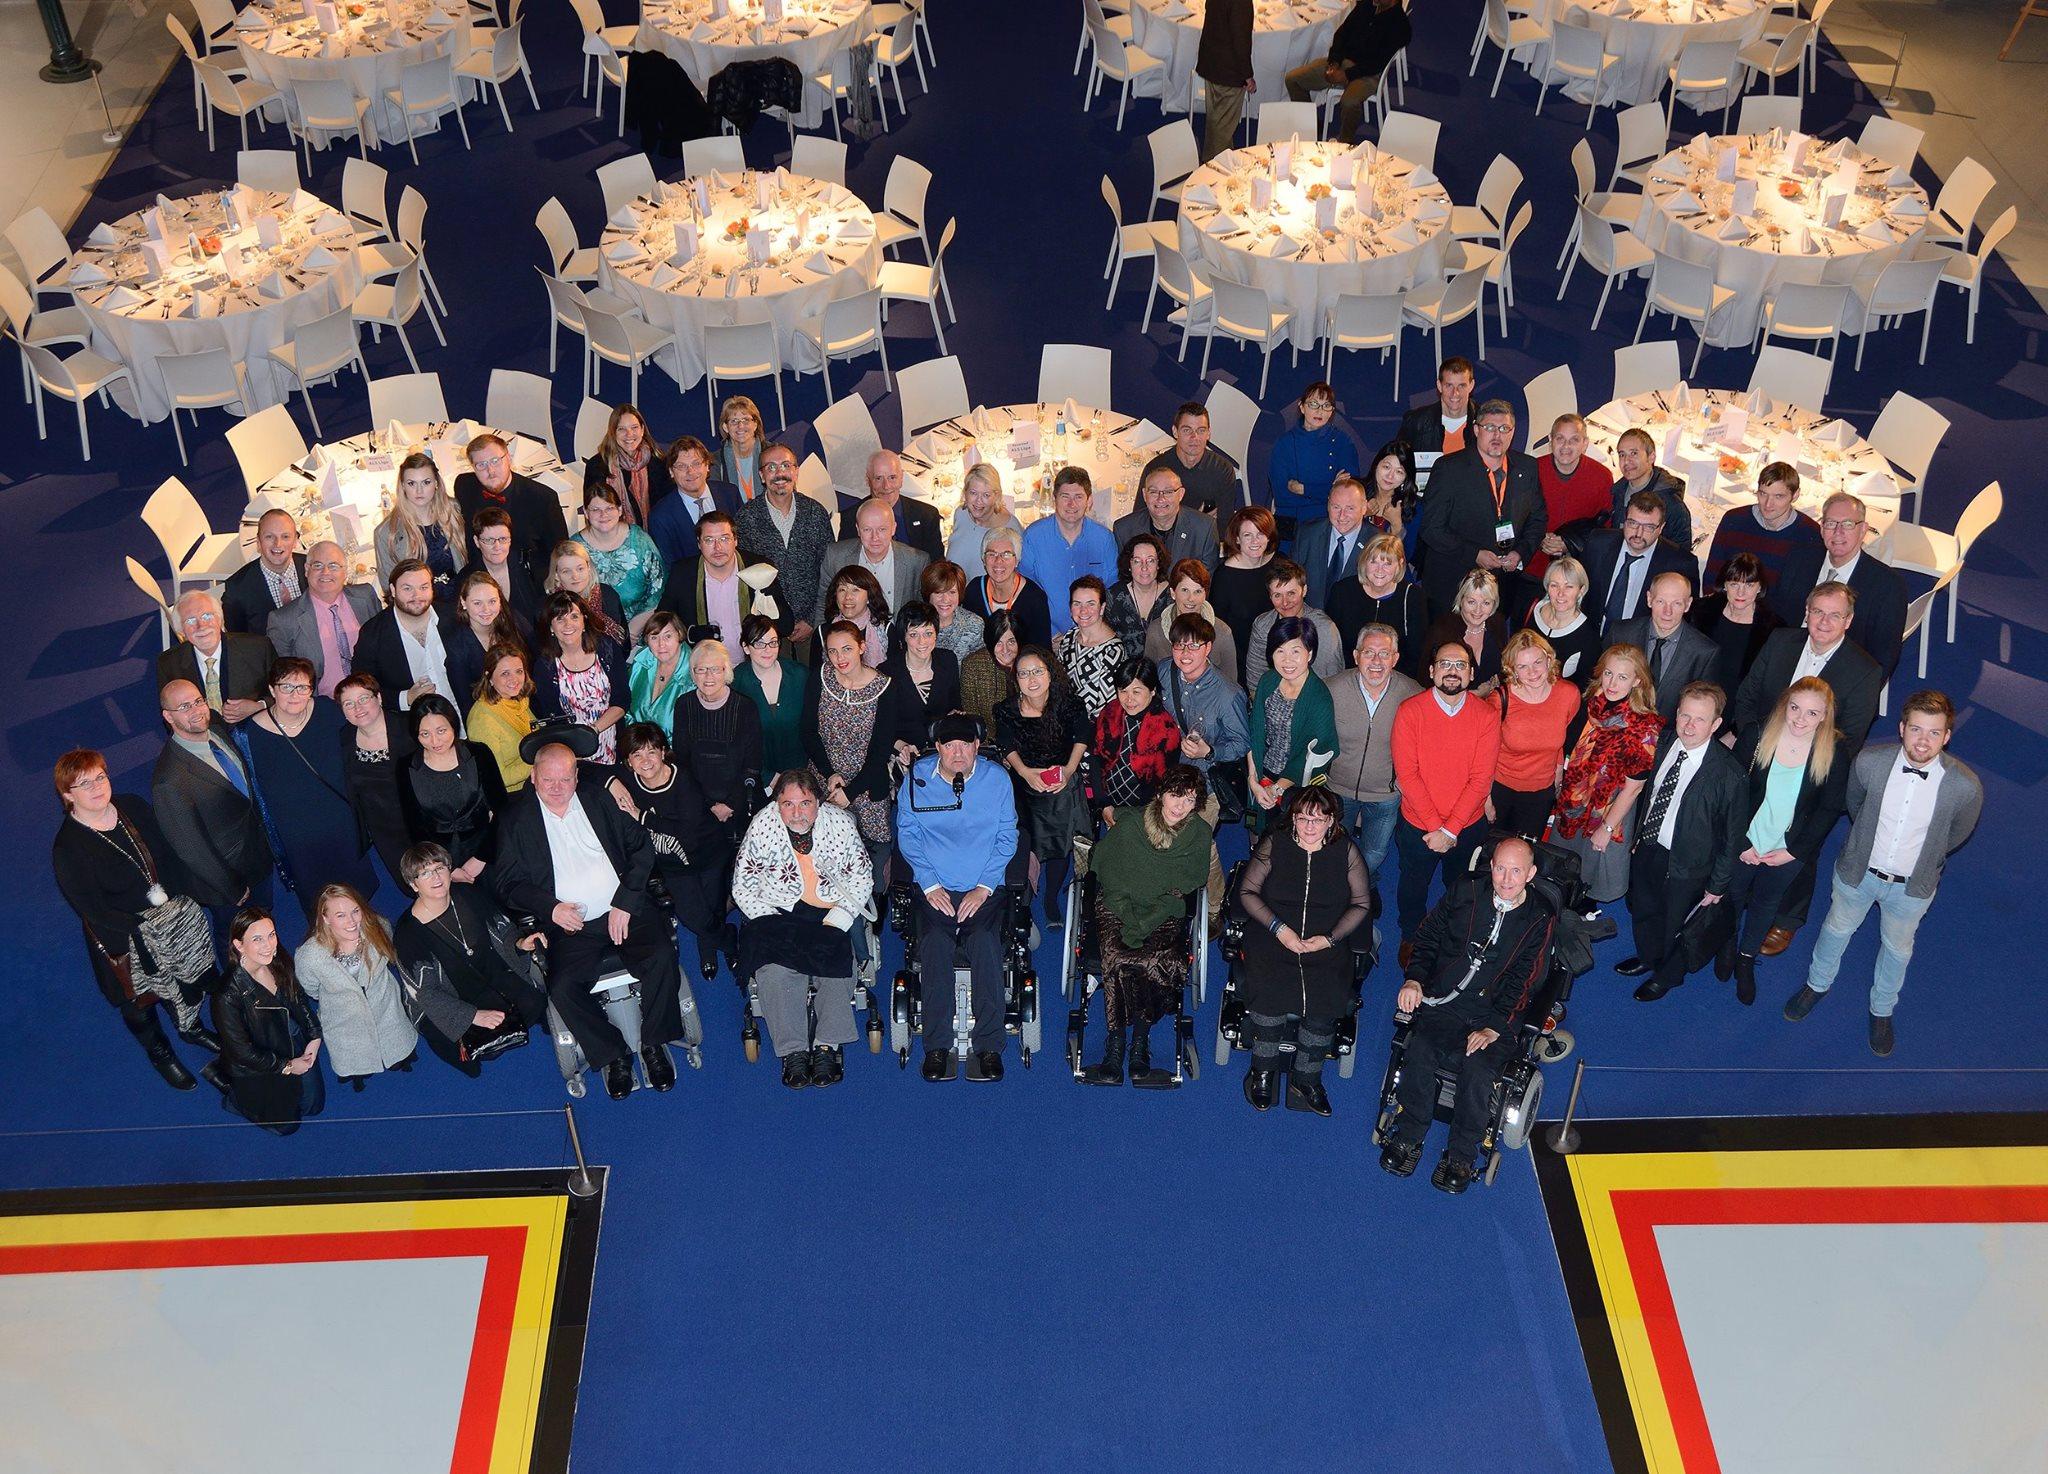 2014 Alliance Meeting Group Photo